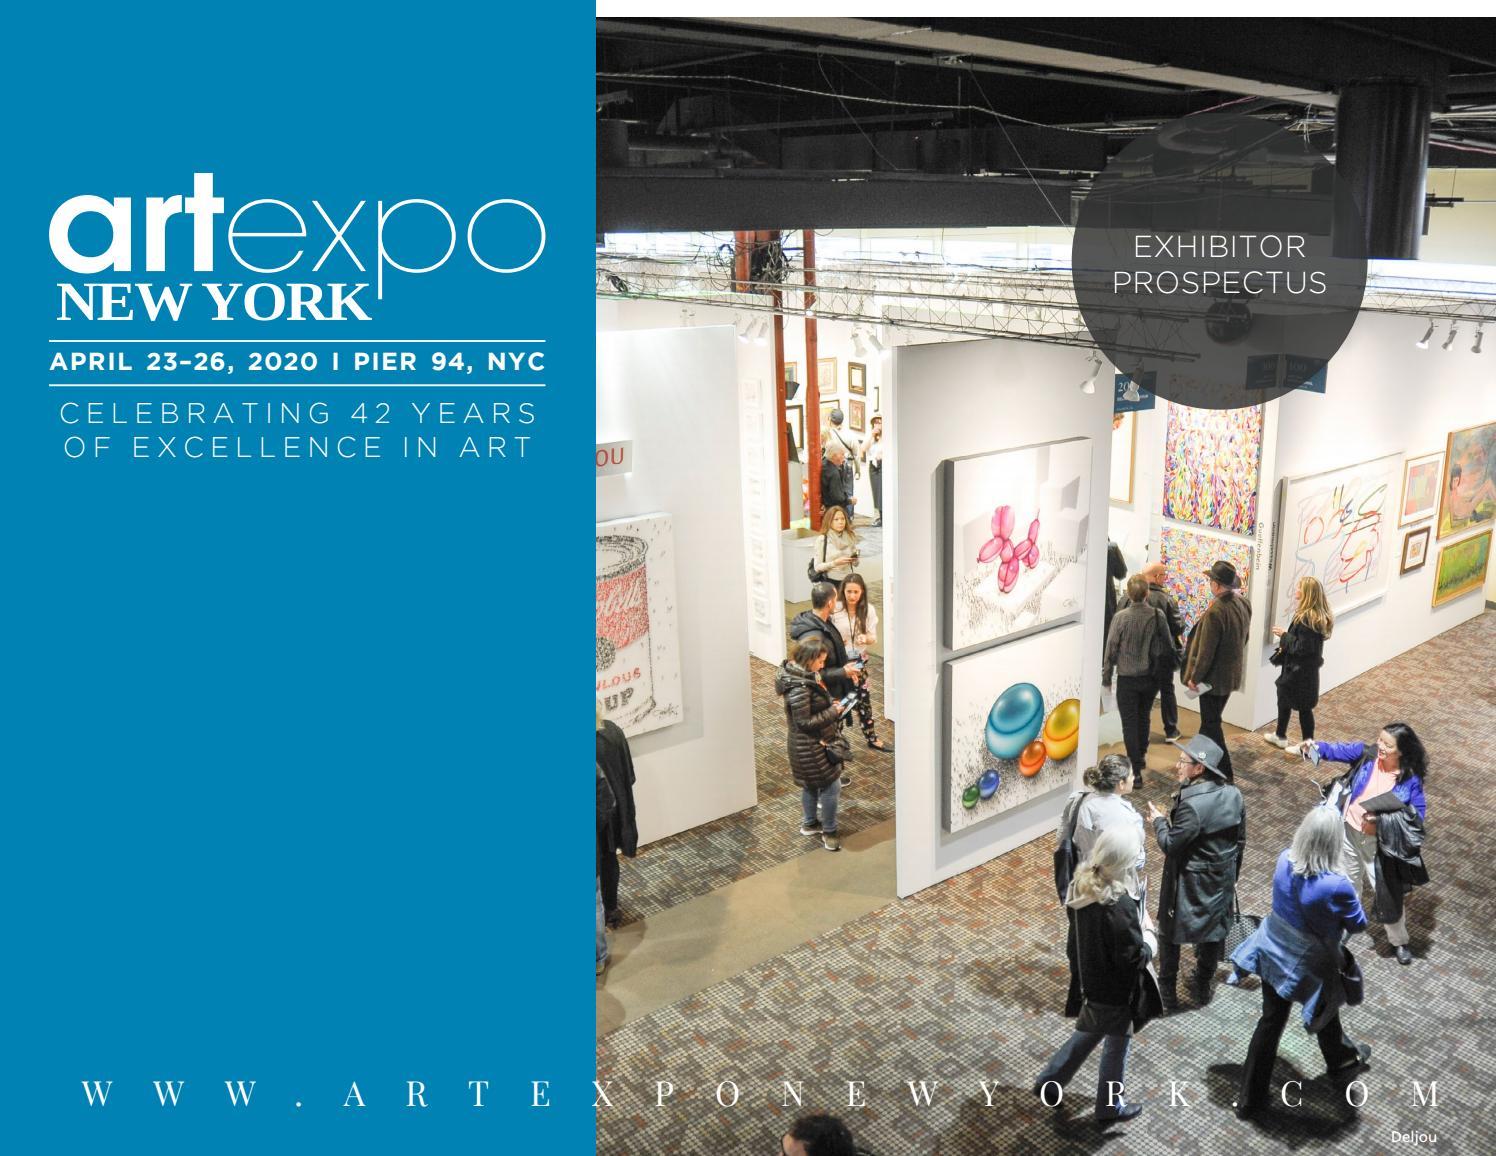 Art Fair New York 2020.Aeny20 Exhibitor Prospectus By Redwood Media Group Issuu